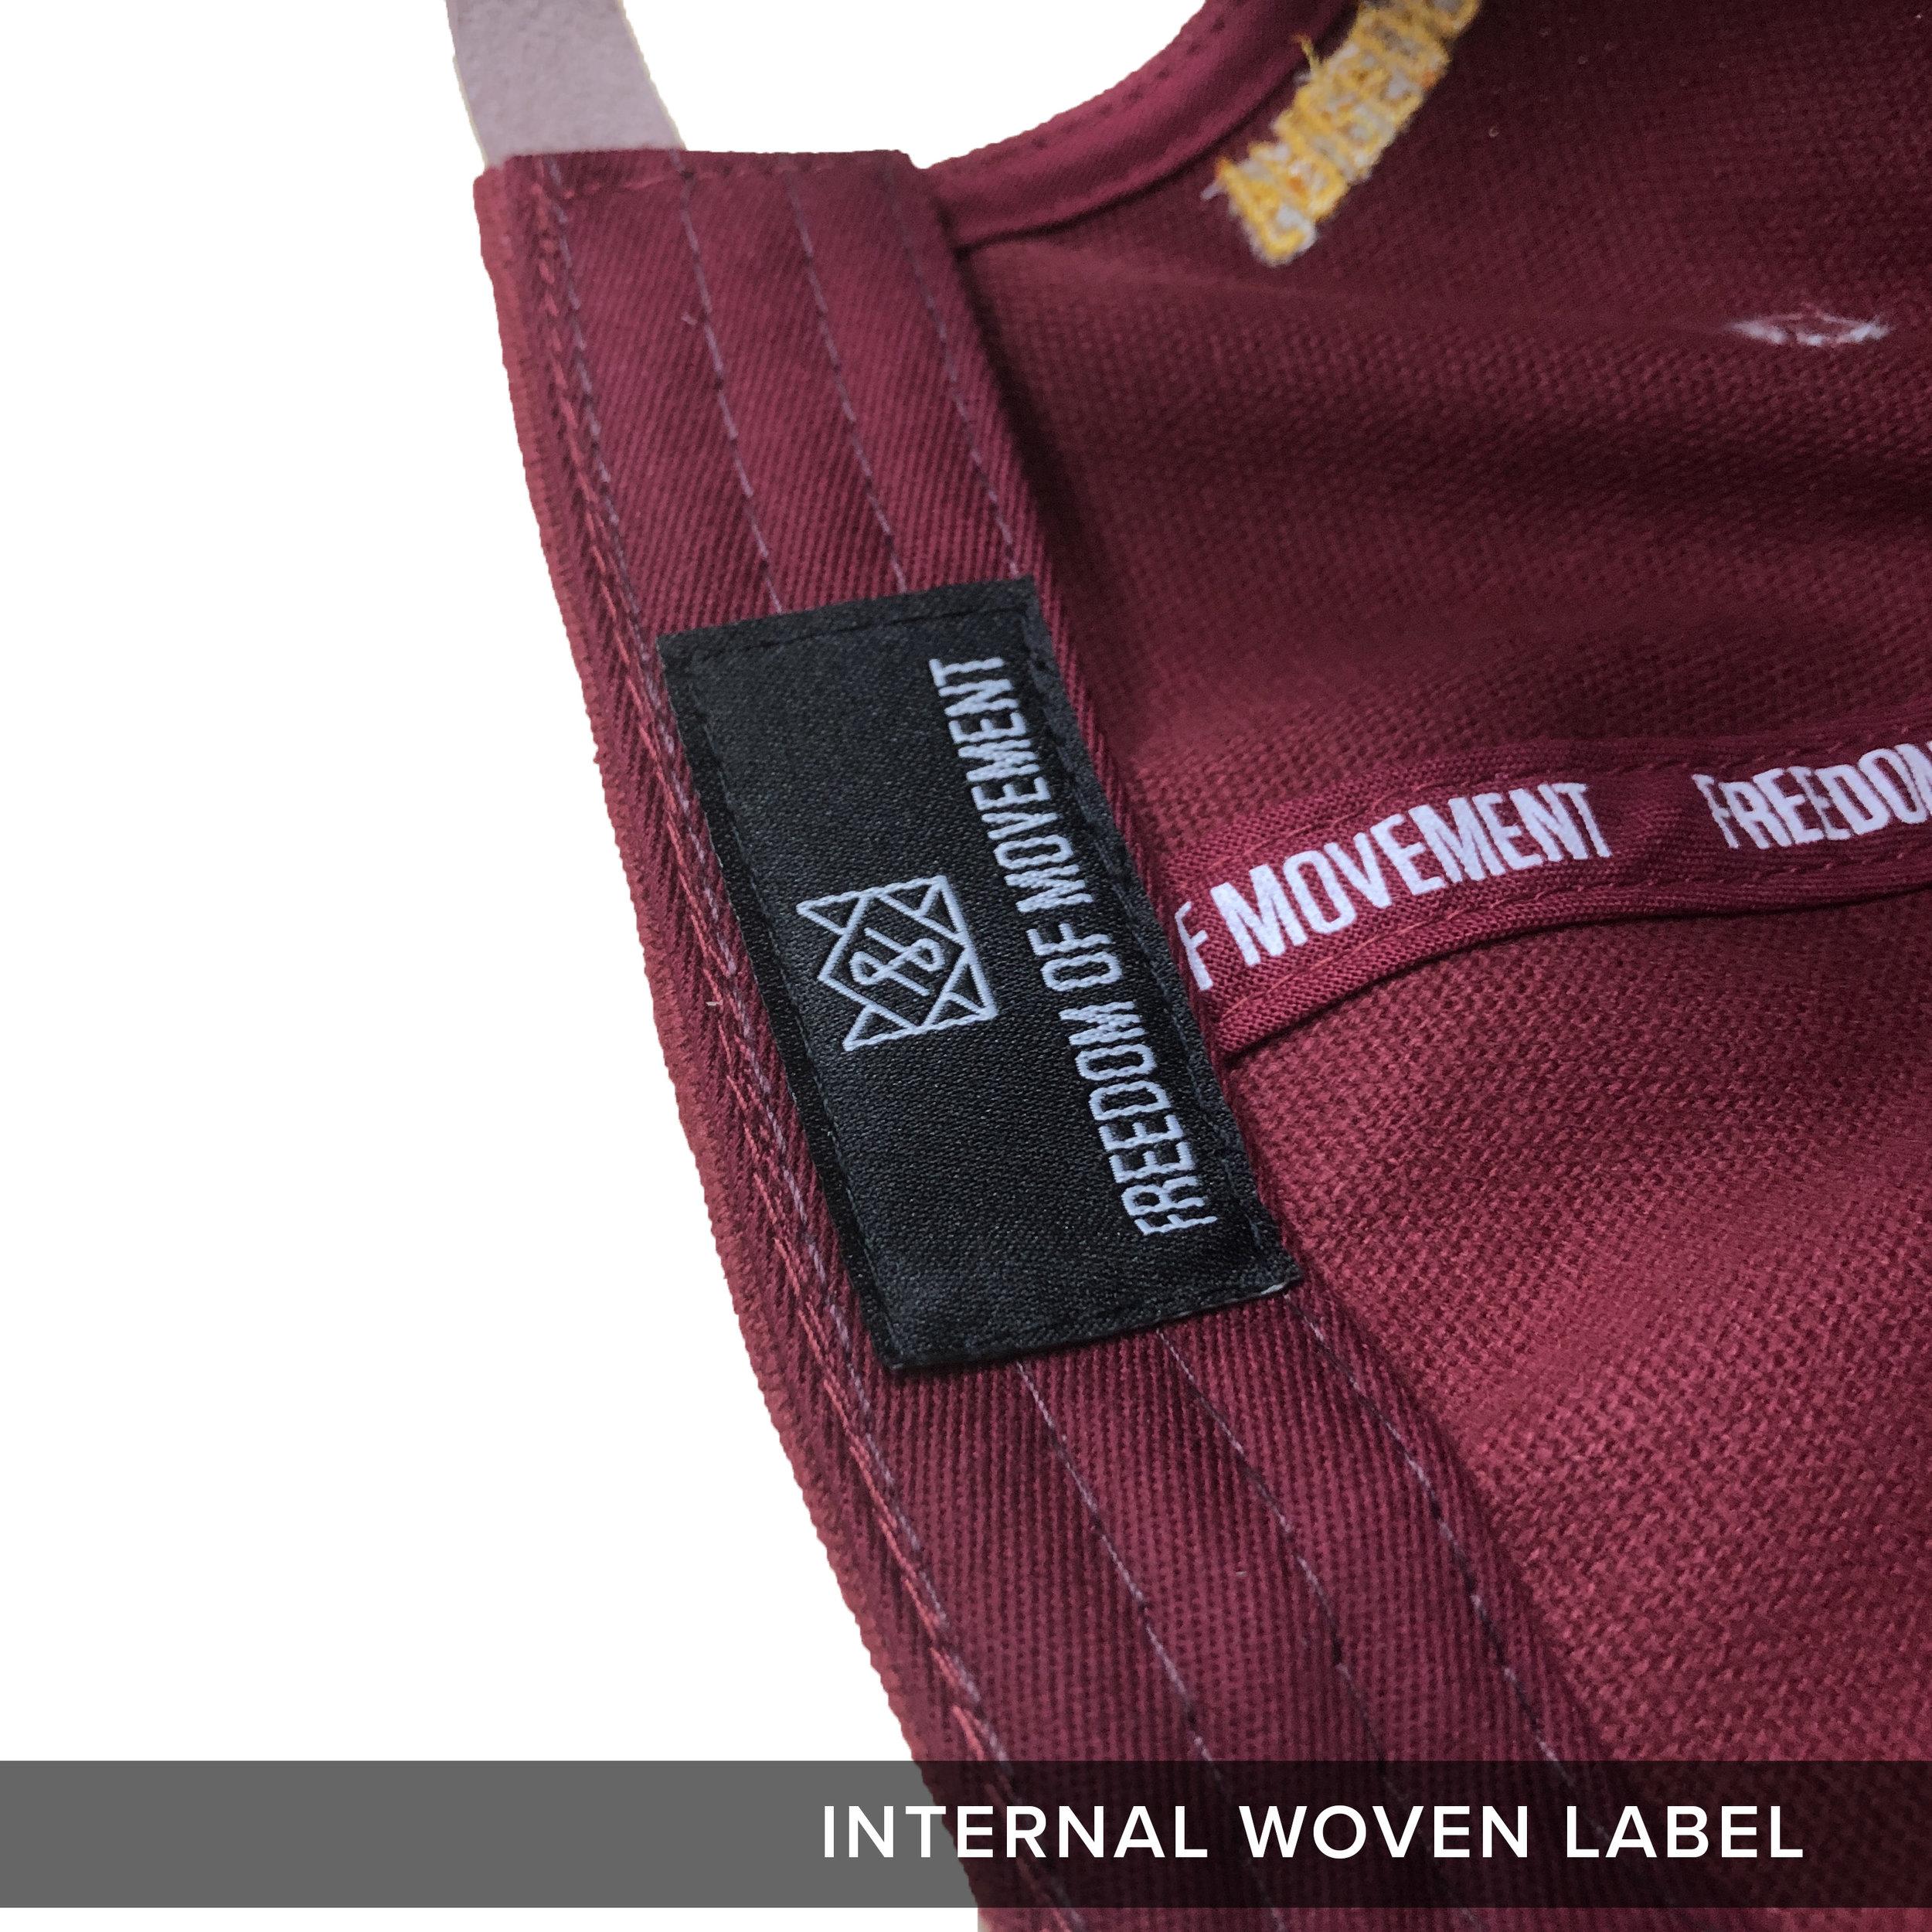 sweatband_woven_label.jpg